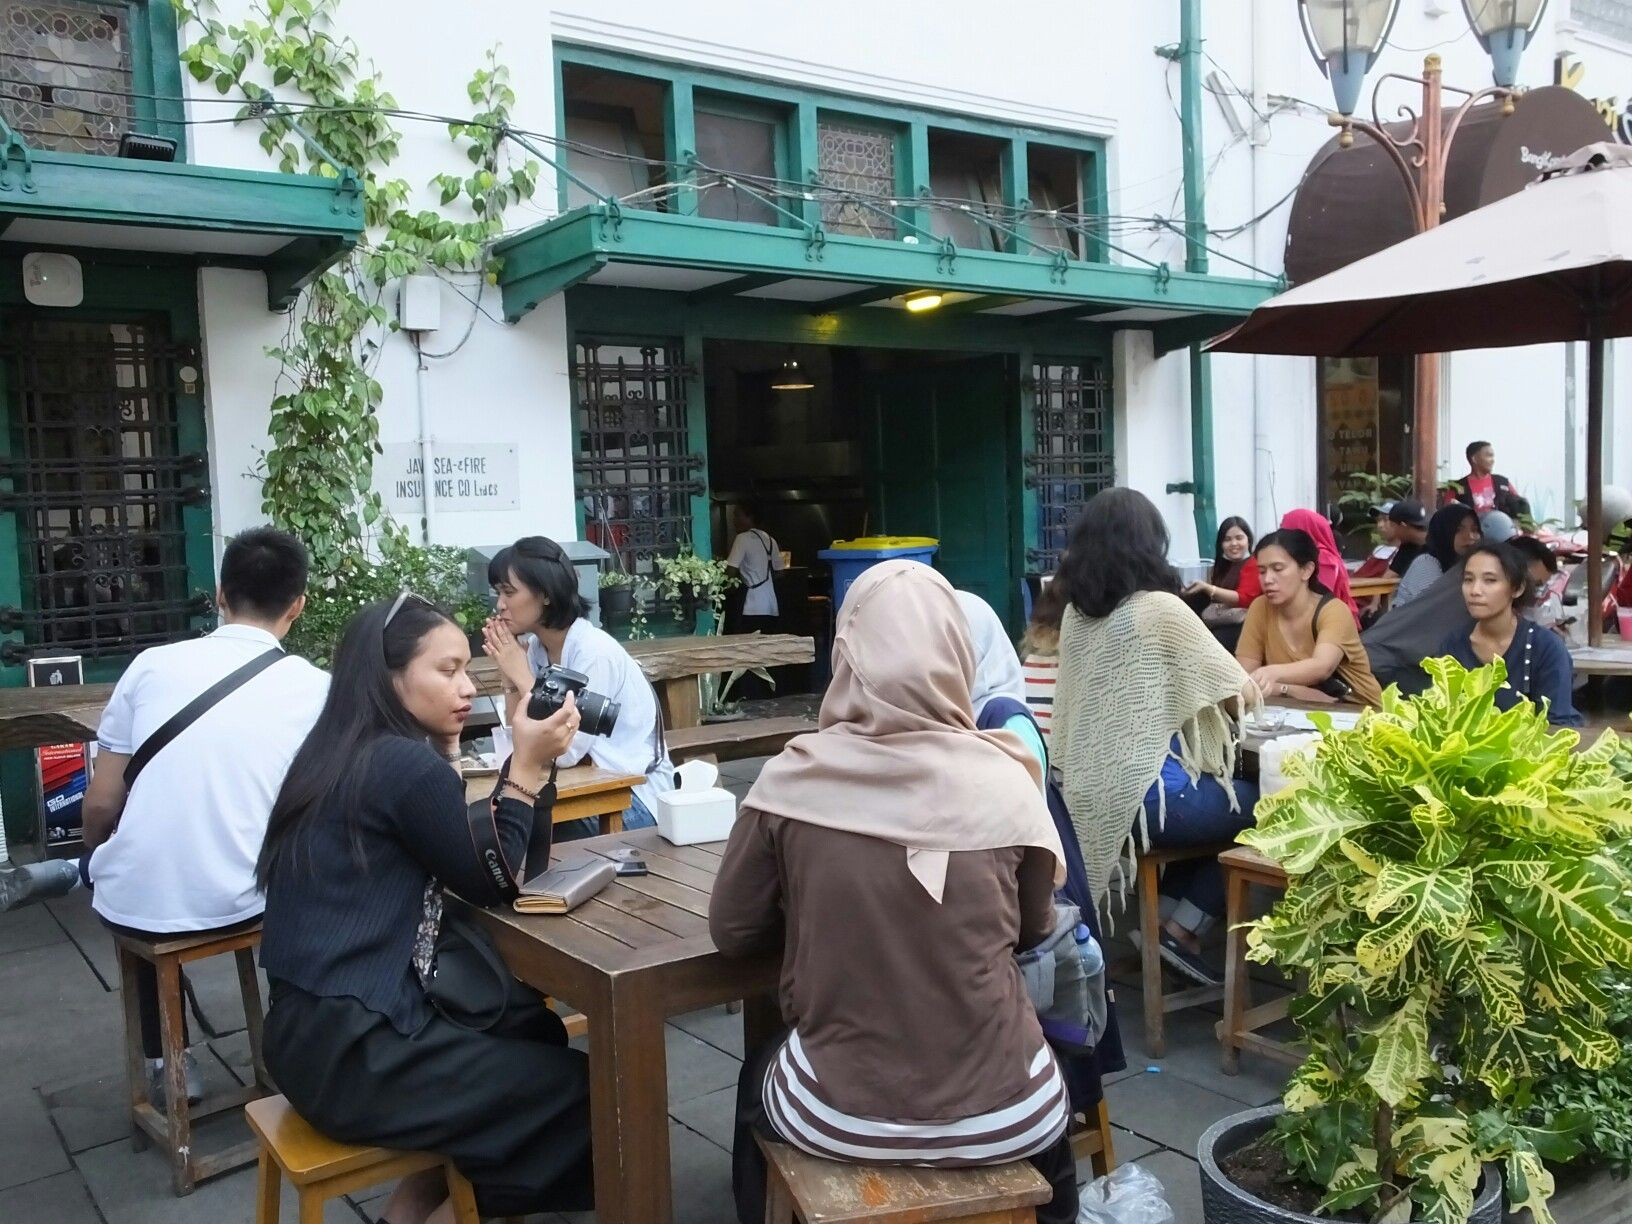 Ini Adalah Salah Satu Yg Paling Hits Di Jakarta Di Pusat Kota Yg